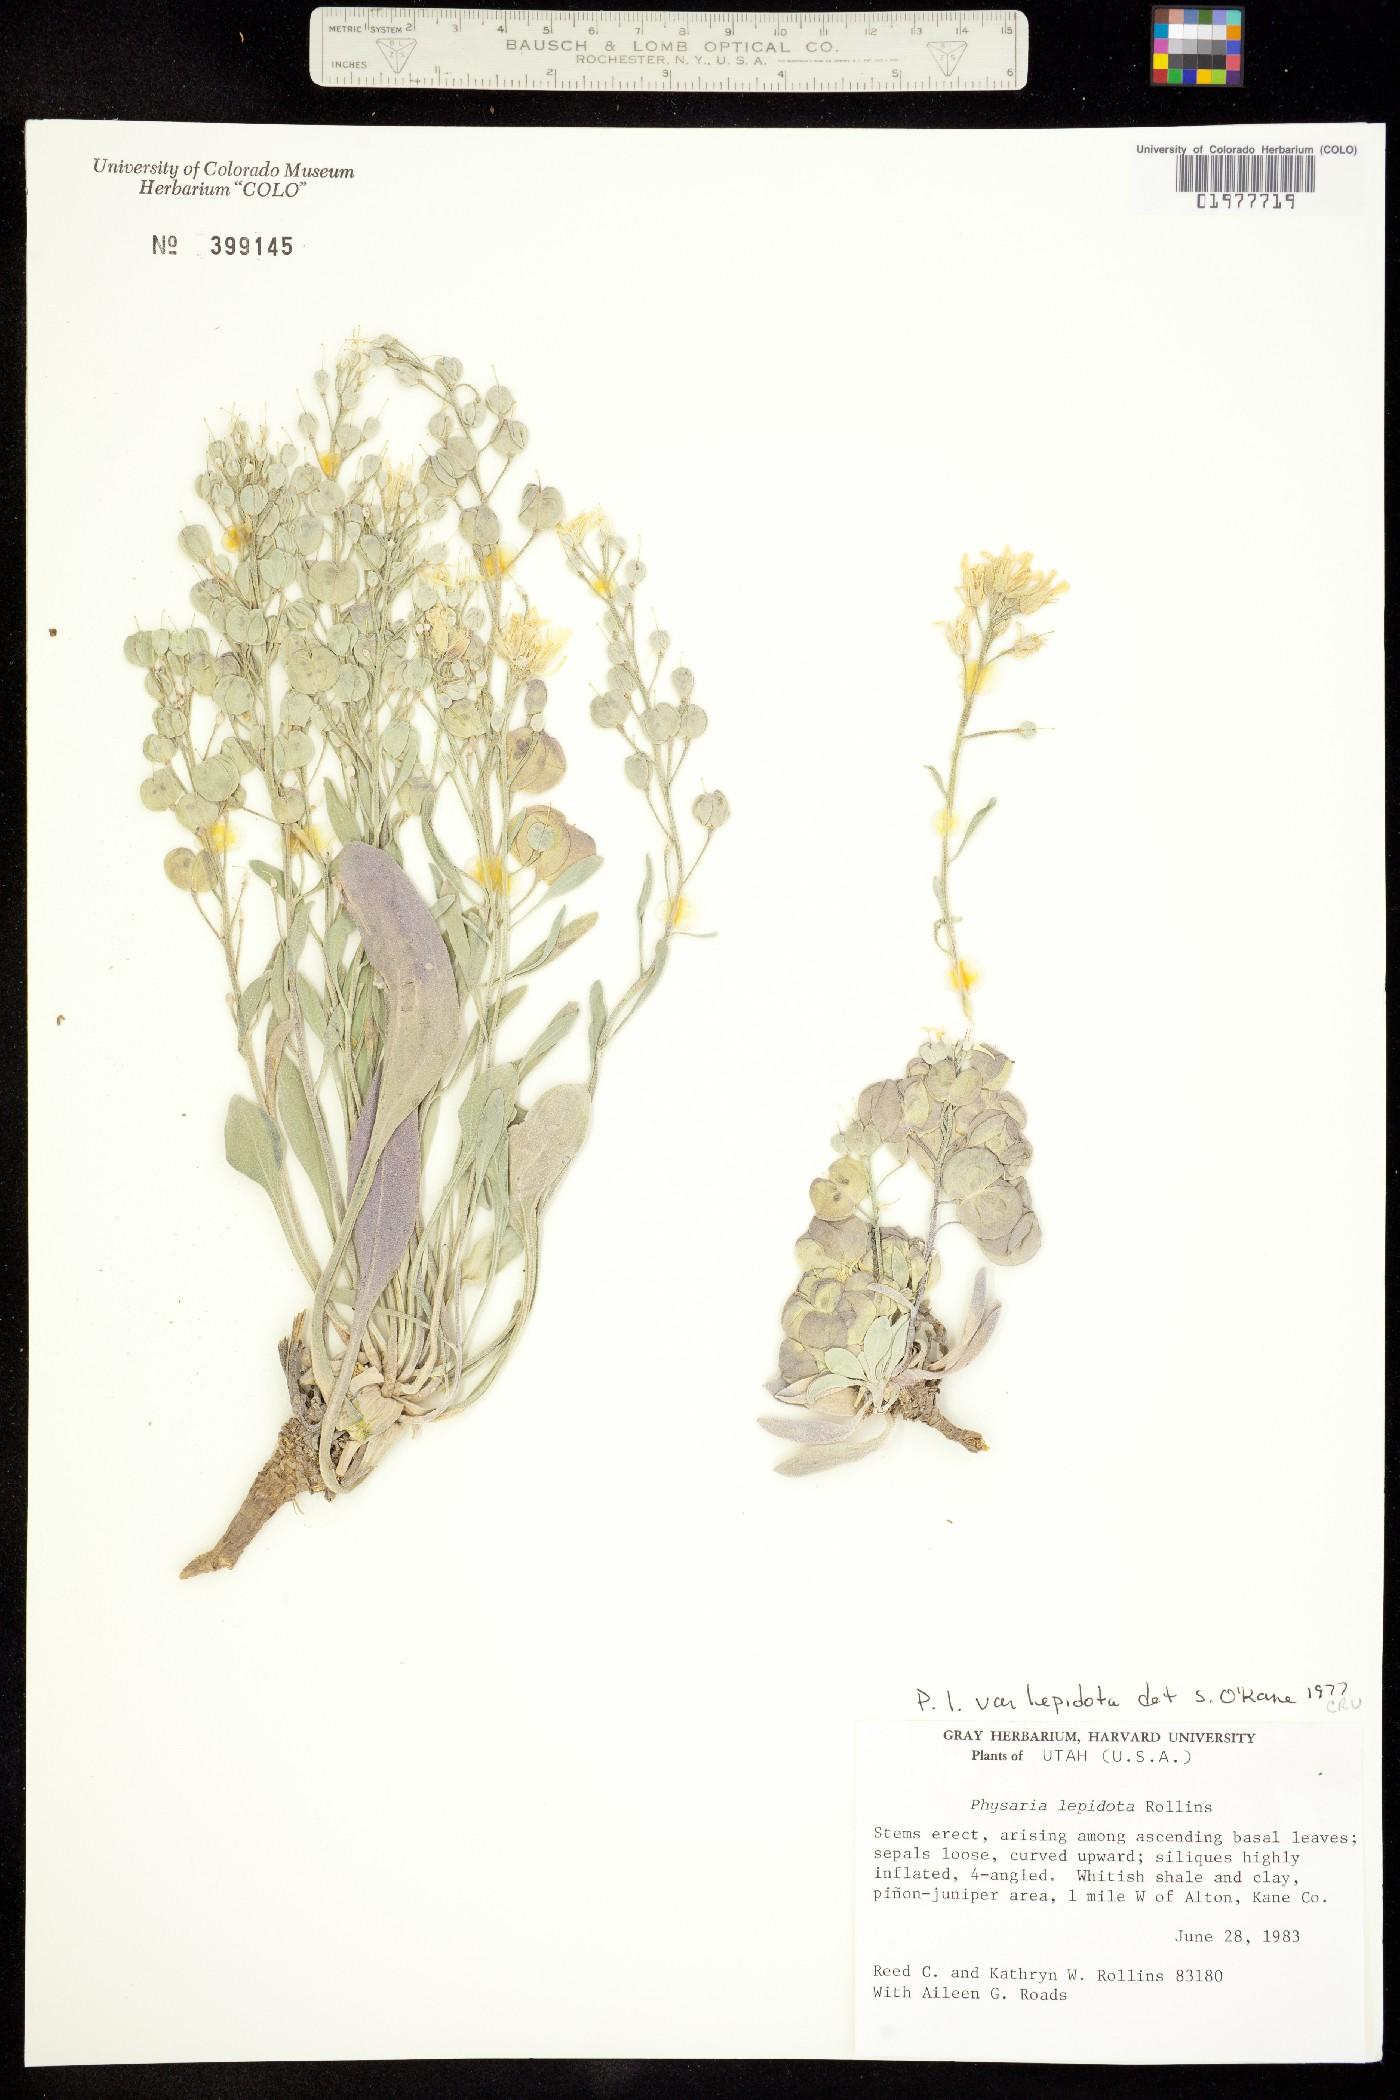 Physaria lepidota ssp. lepidota image